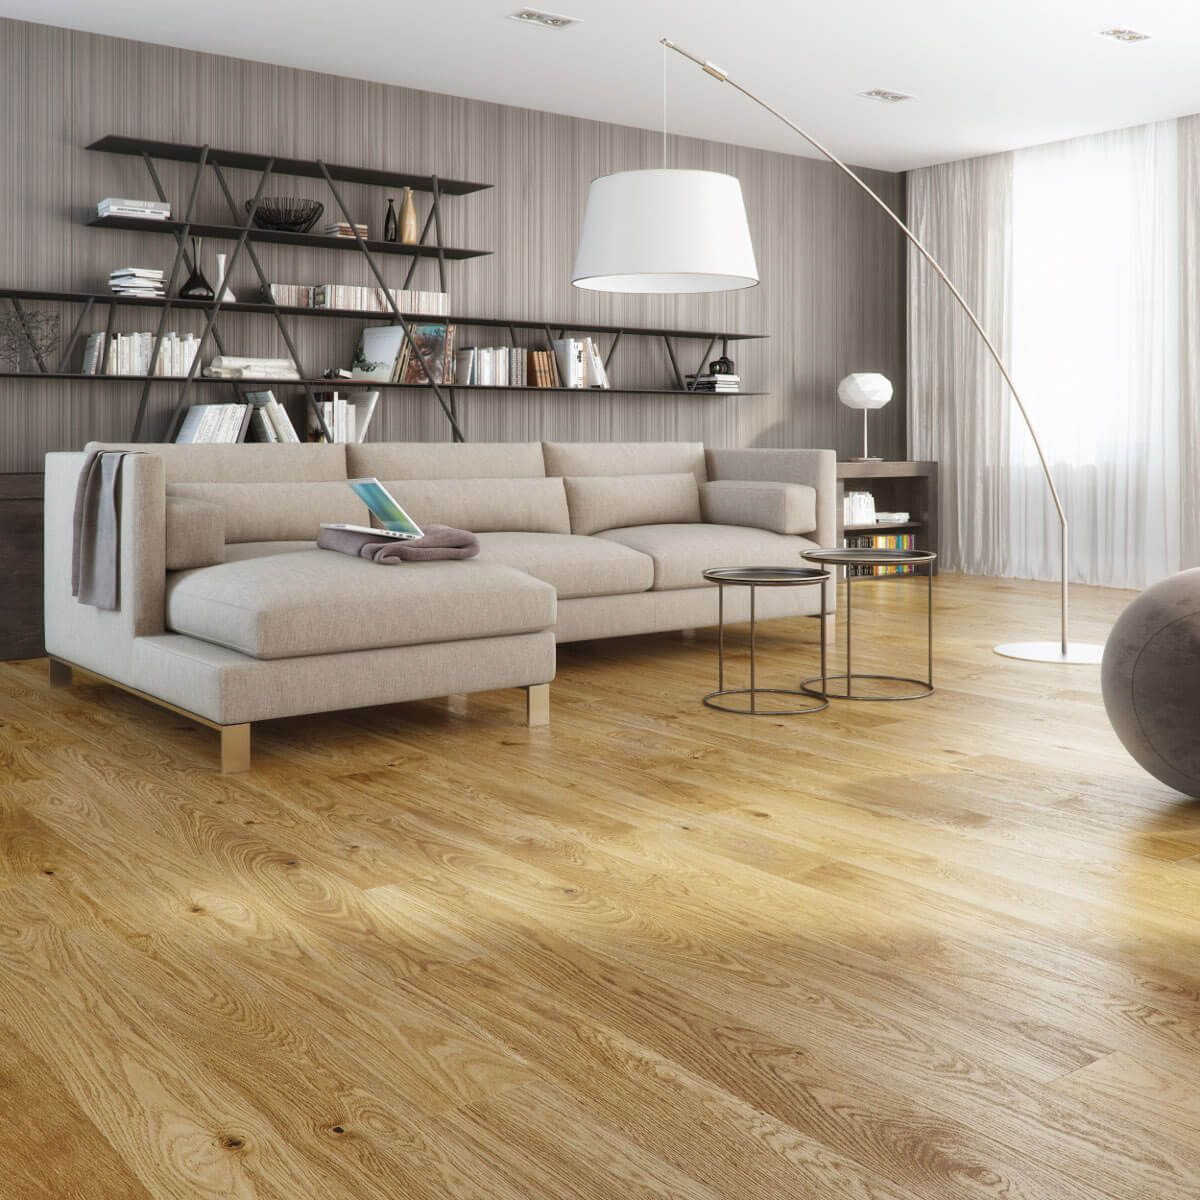 Pin by Agatka Wachowiak on Home Engineered wood floors